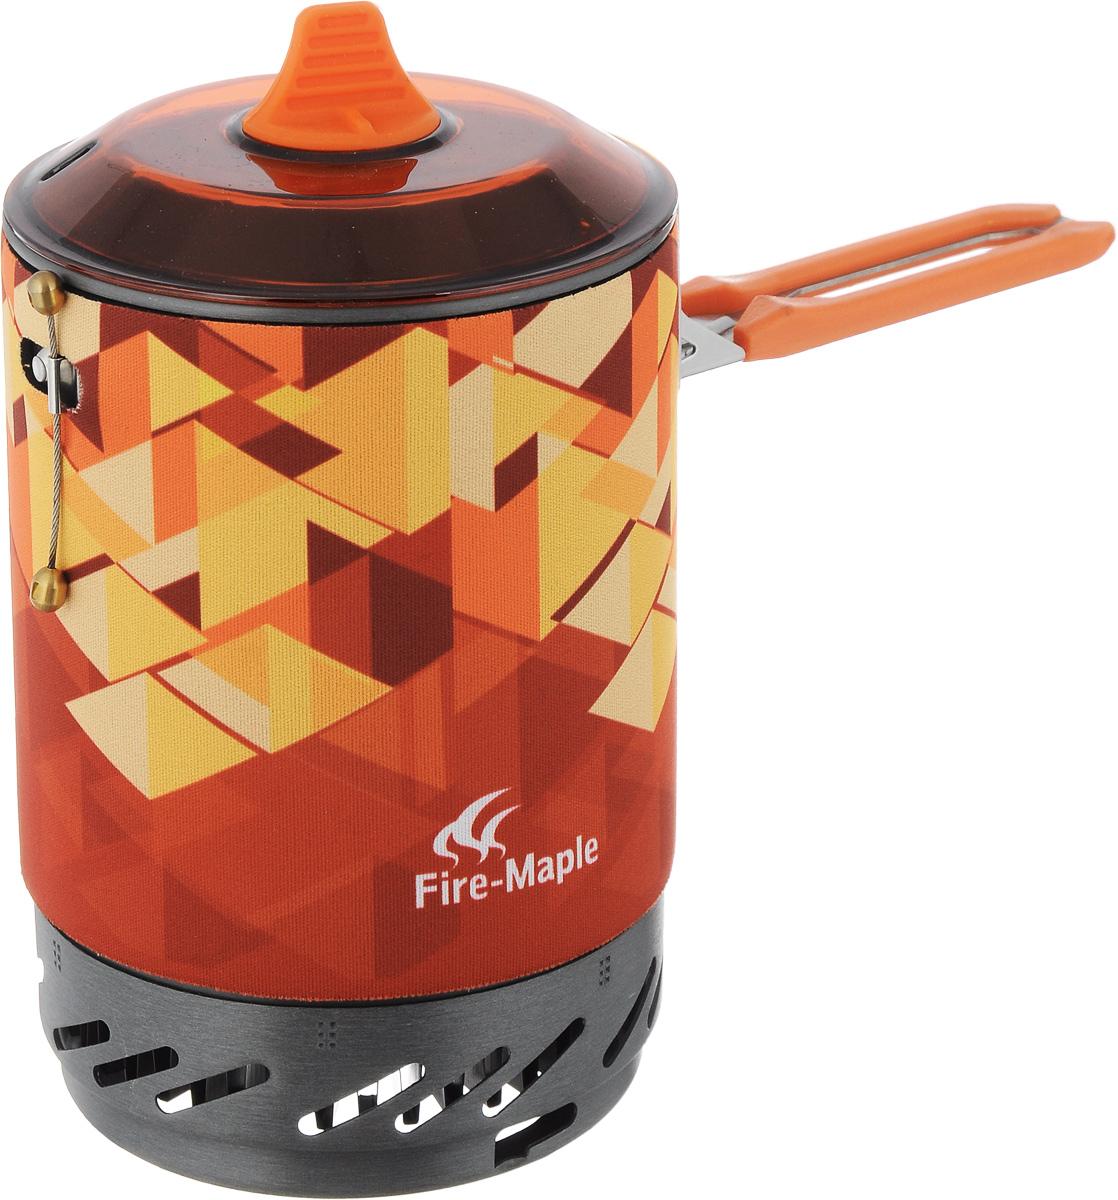 Система приготовления пищи Fire-Maple